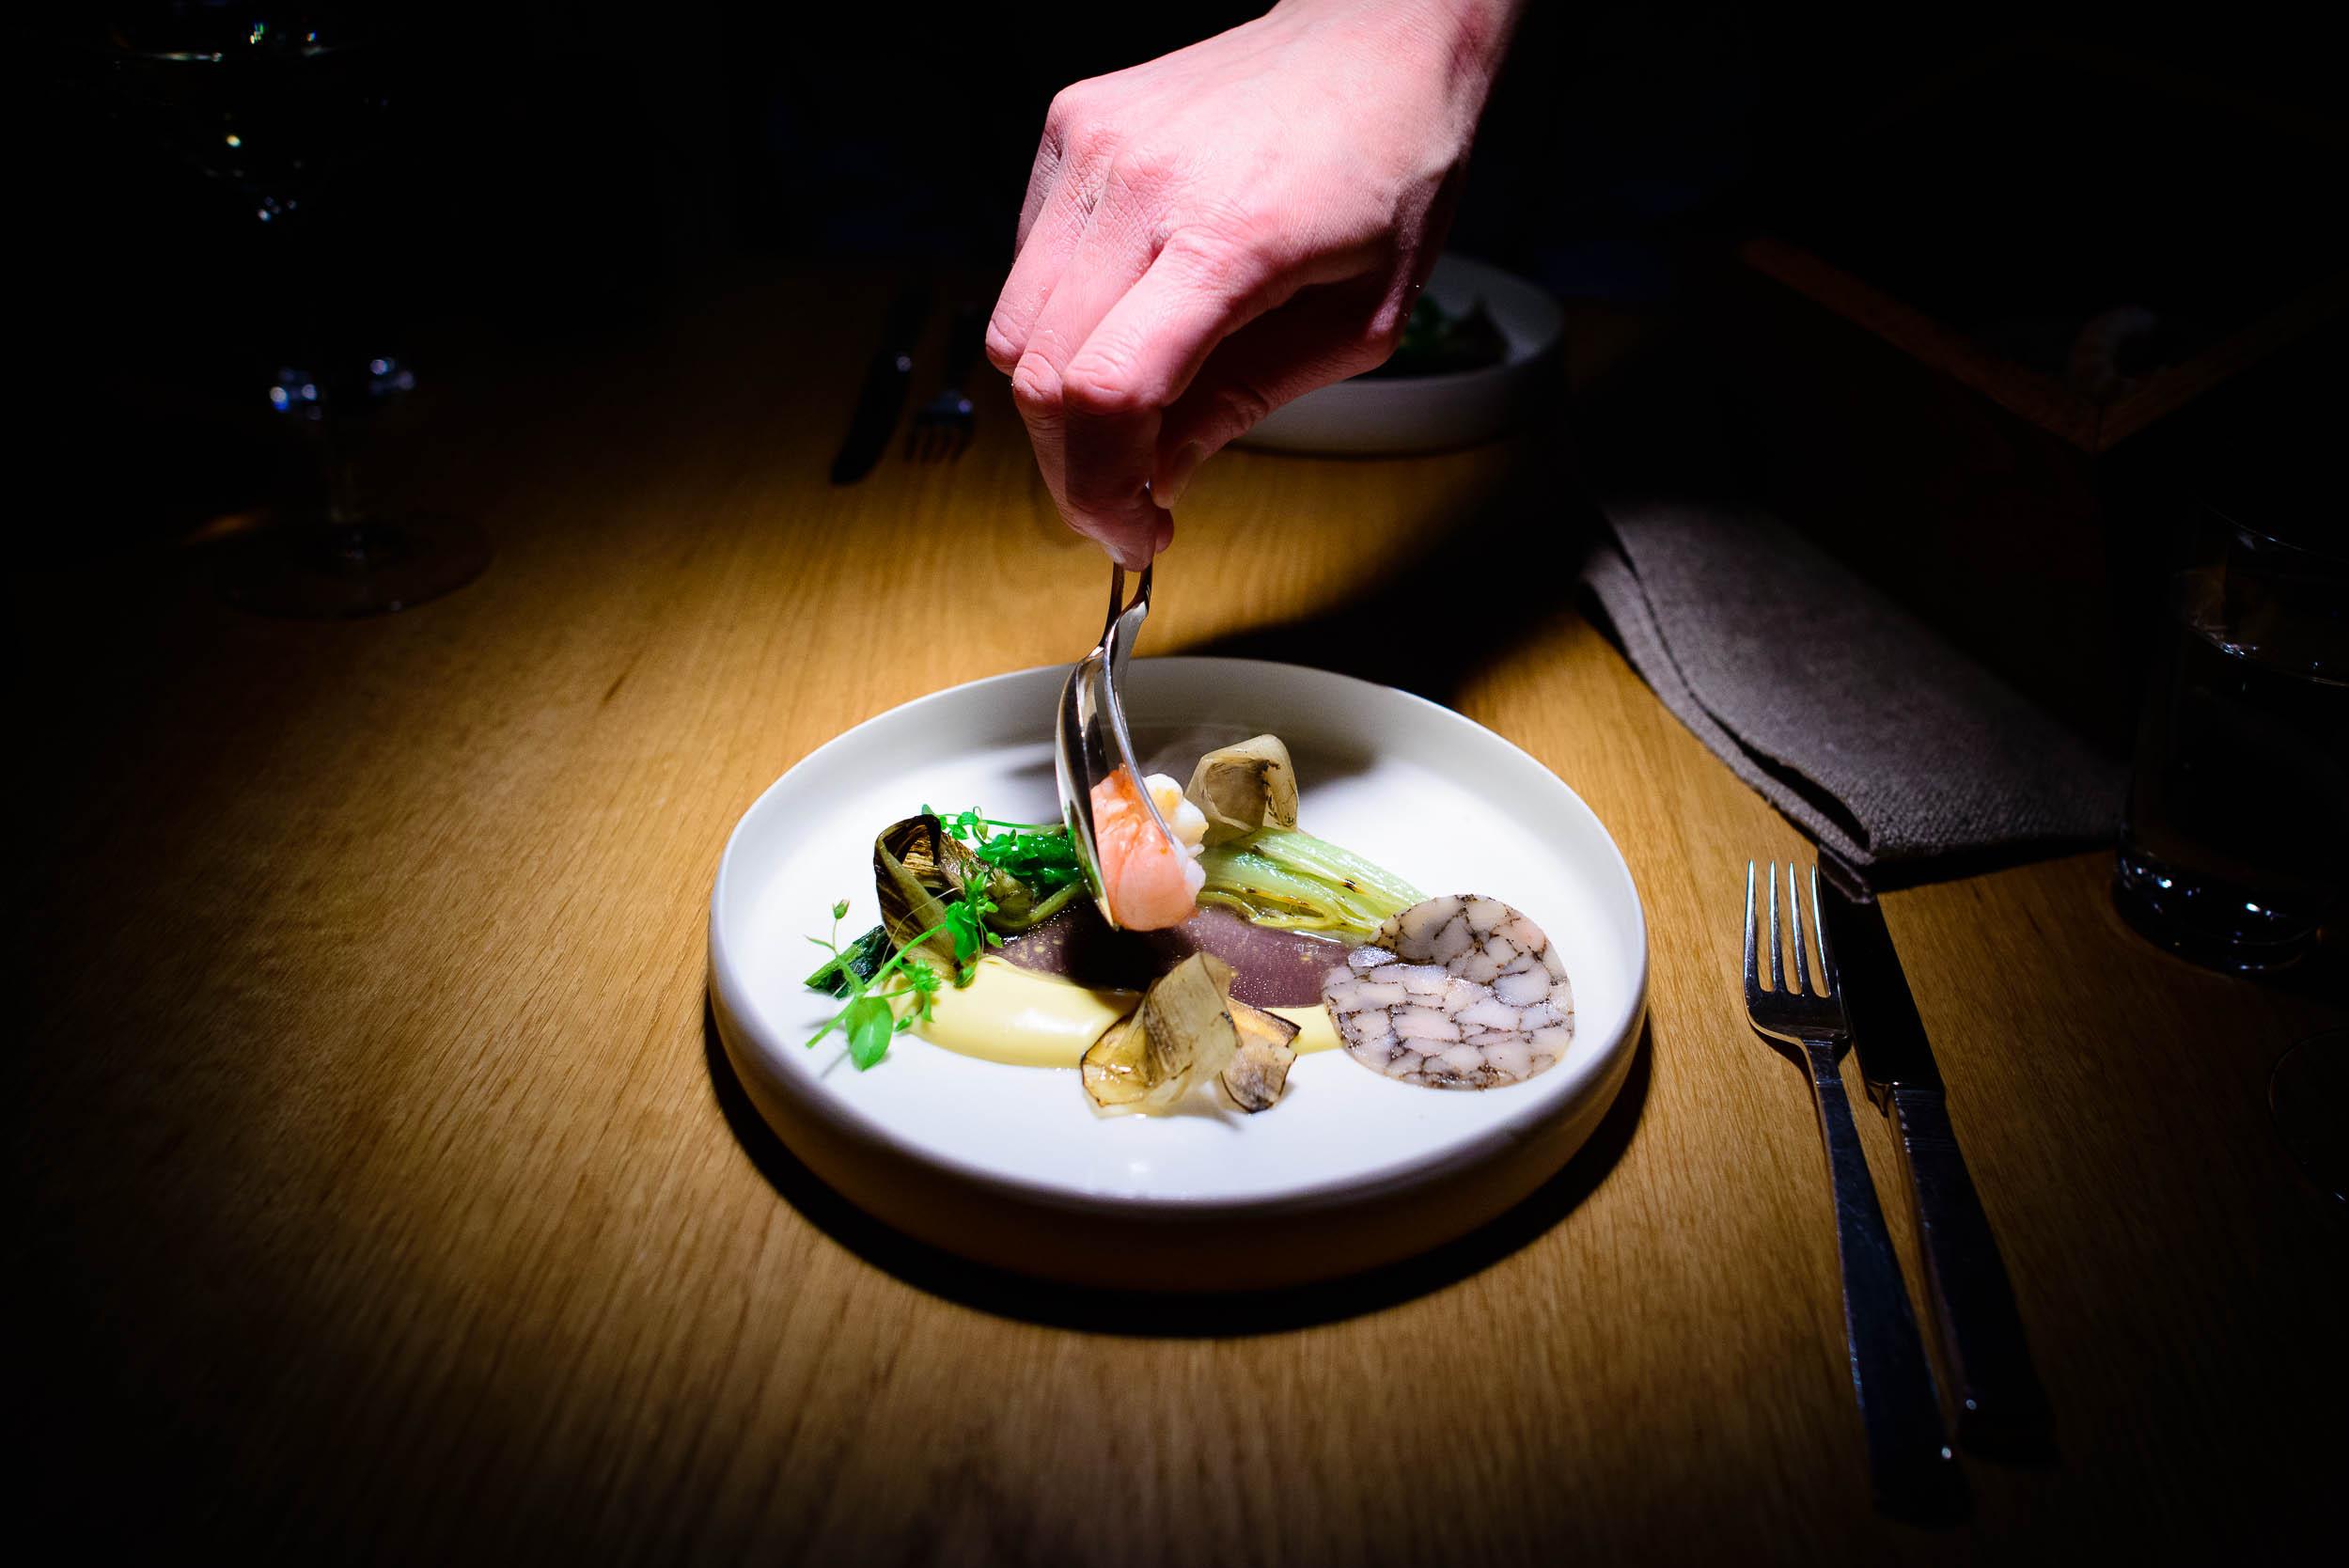 Herb grilled langostine with summer chanterelles, warm sour crea